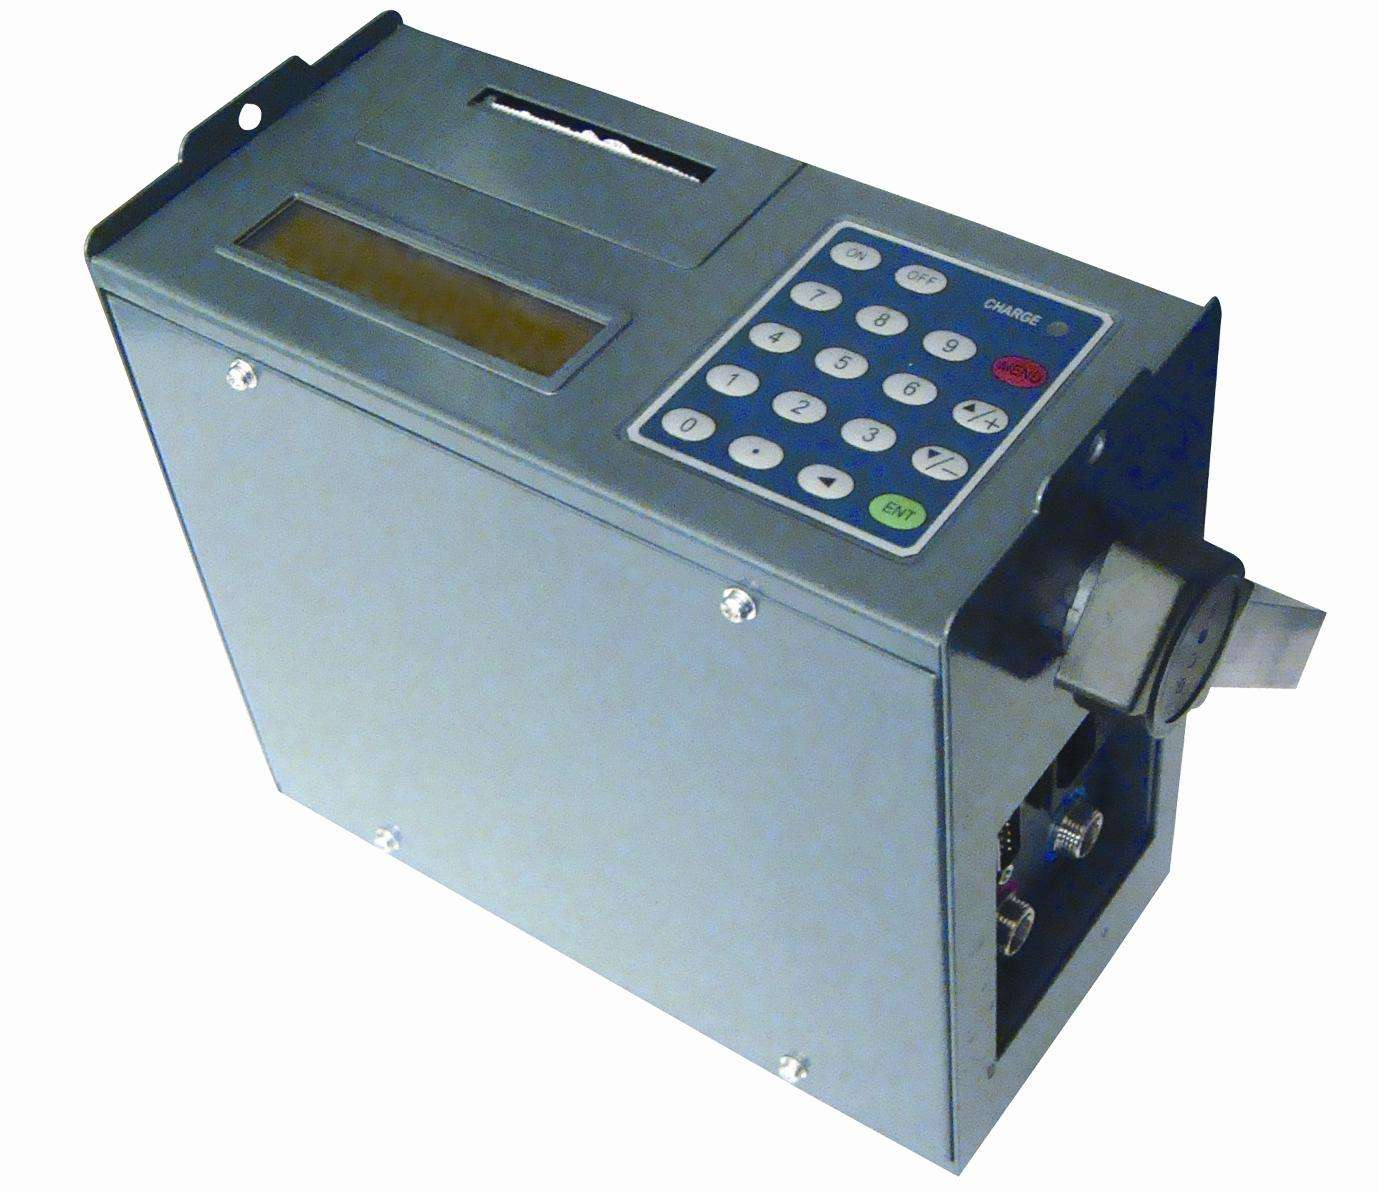 CPK-100便携式超声波流量计/热量计